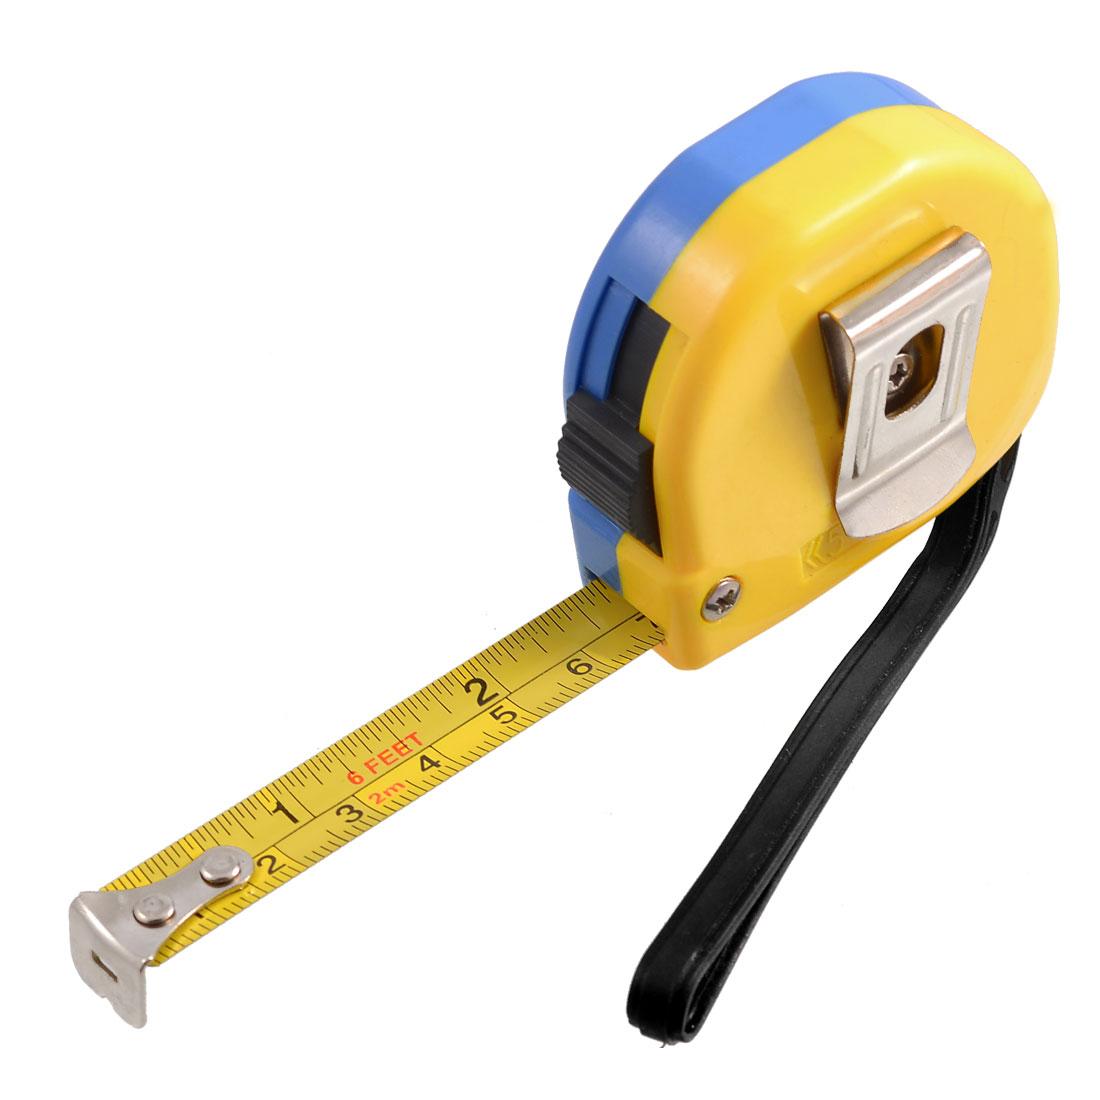 2M 6Ft Retractable Metric English Ruler Tape Carpenter Measuring Tool